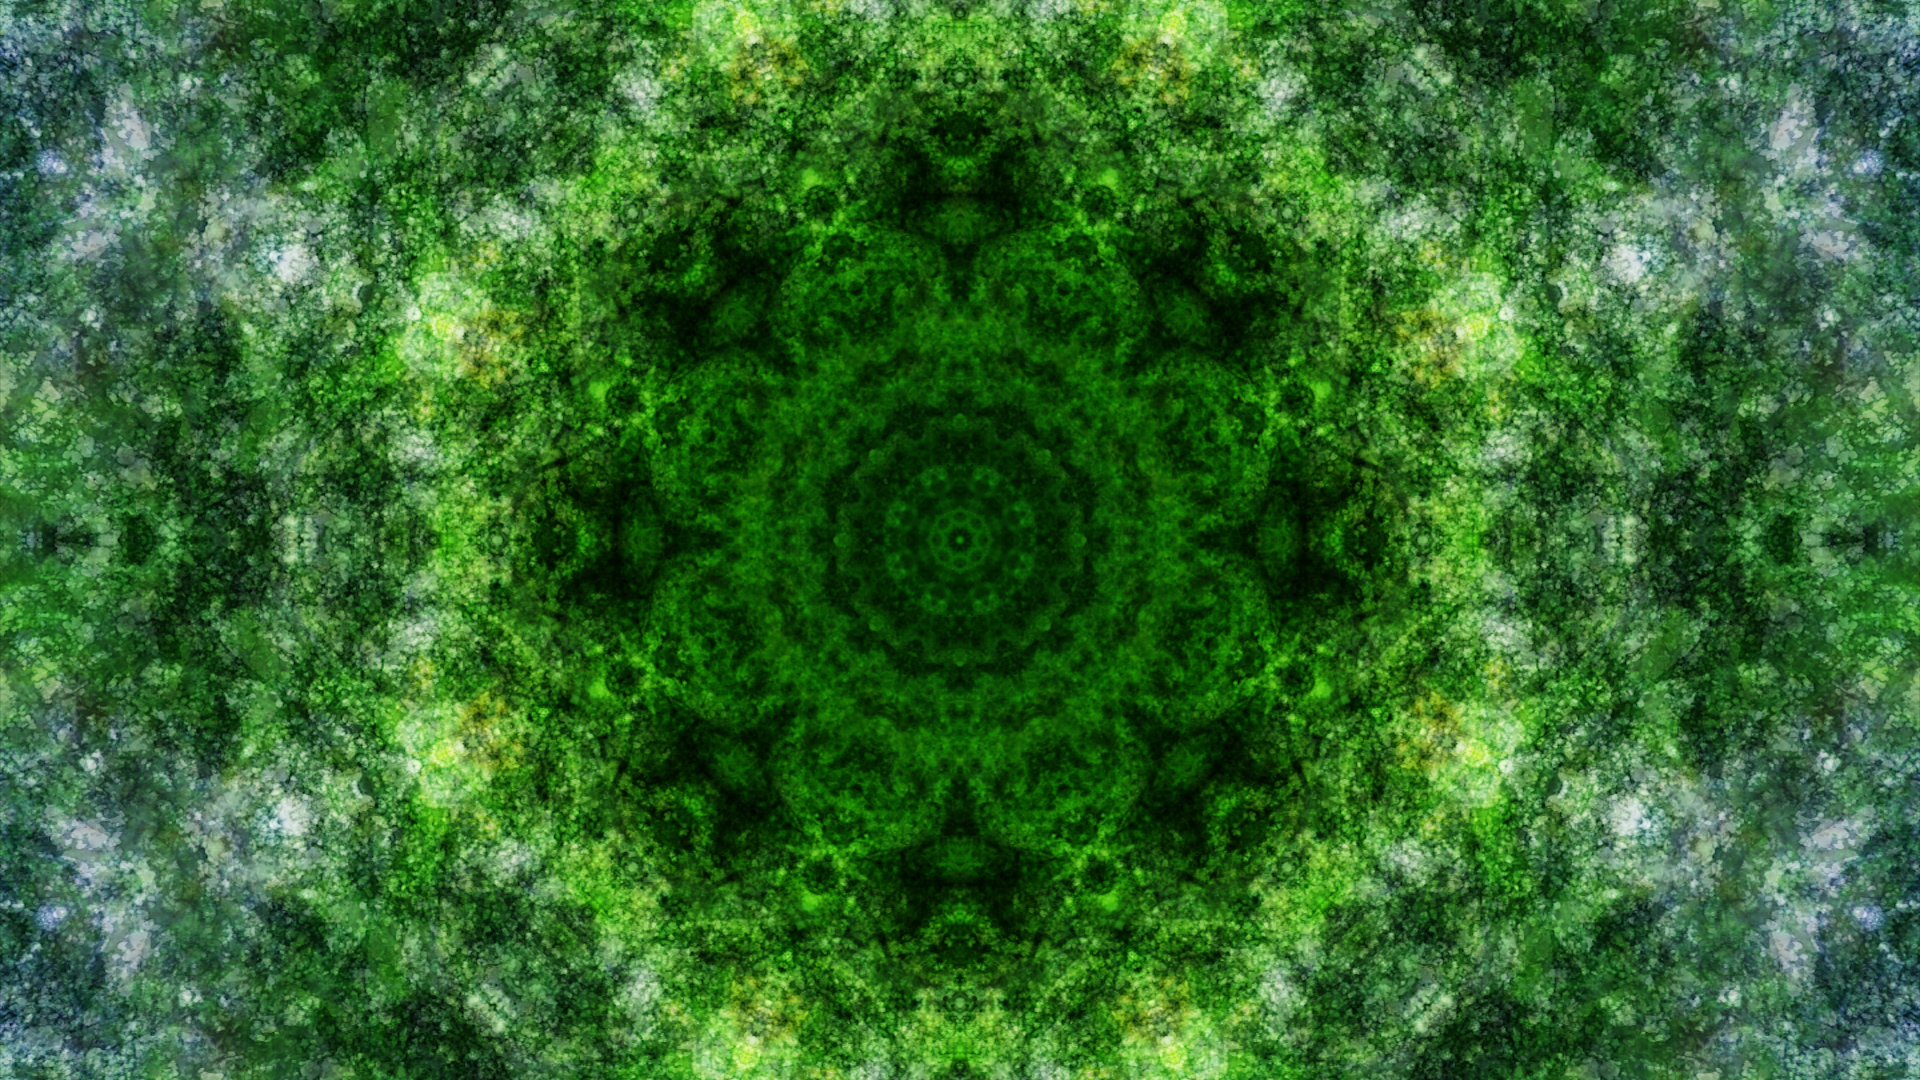 Emitting Velocity - Mohican Forest by Matt Swift Still 7